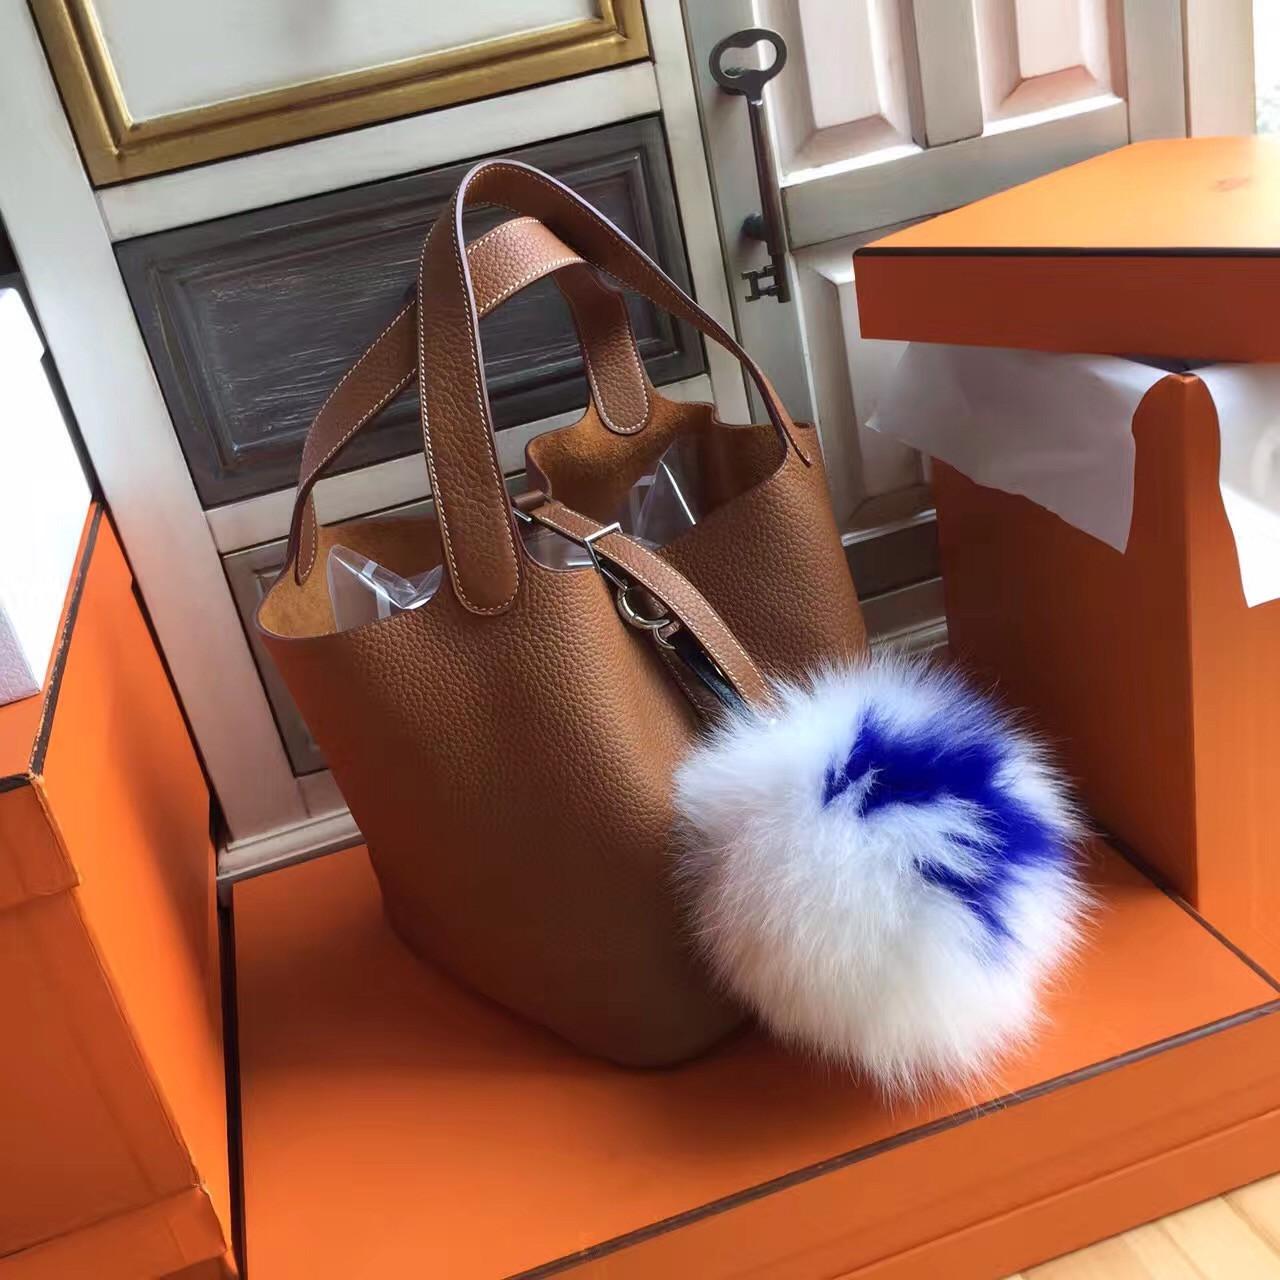 443053daa29a Hermes Gold Picotin Lock MM Togo Leather Bag - Bella Vita Moda